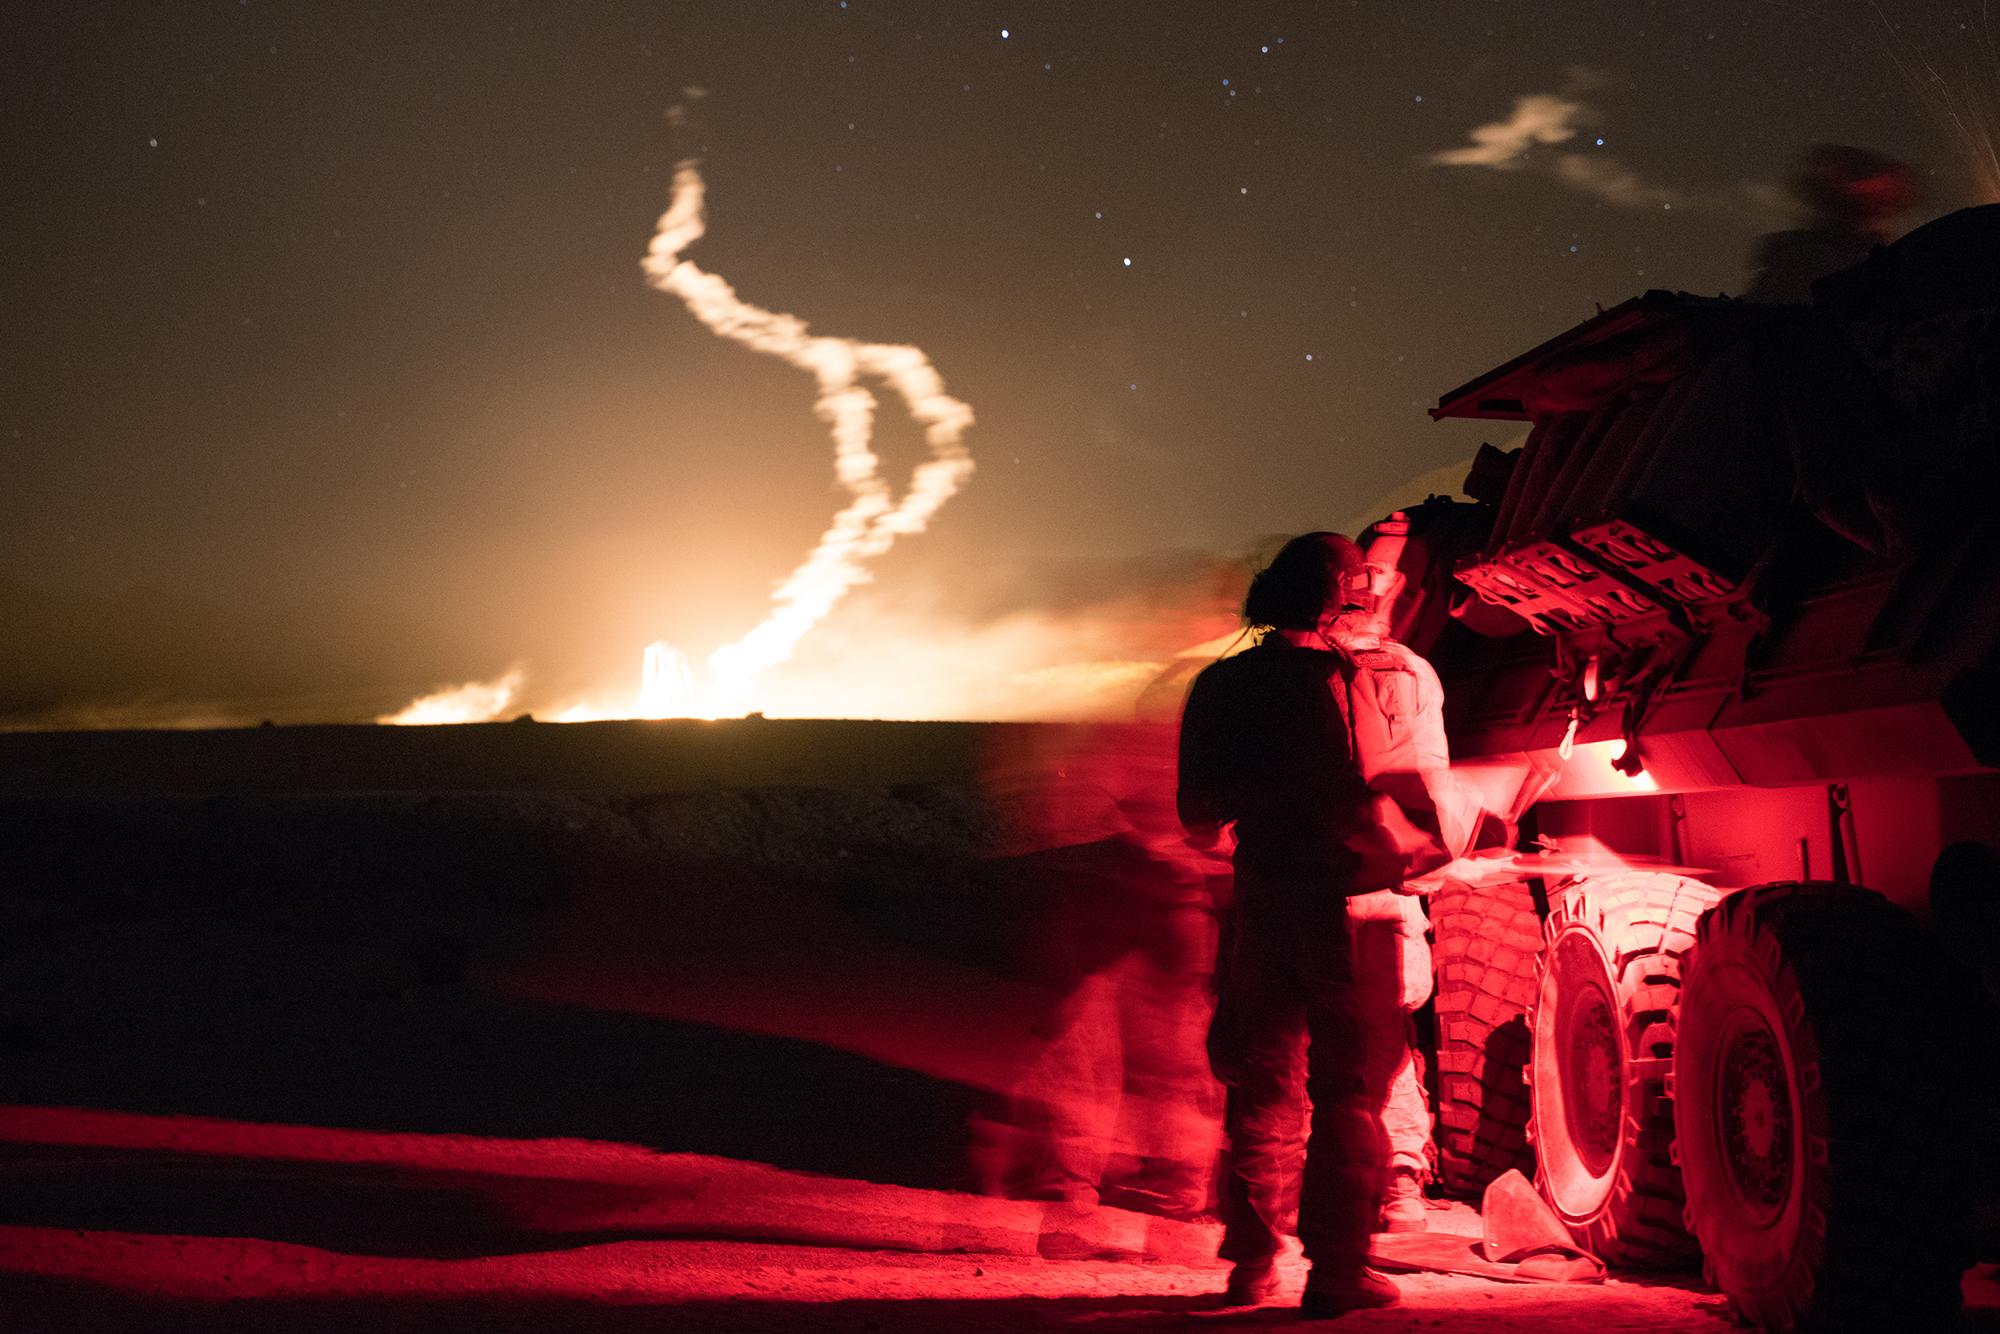 Marines debrief their result during Steel Knight 21, Dec. 4, 2020, at Camp Pendleton, Calif. (Lance Cpl. Gustavo Romero/Marine Corps)